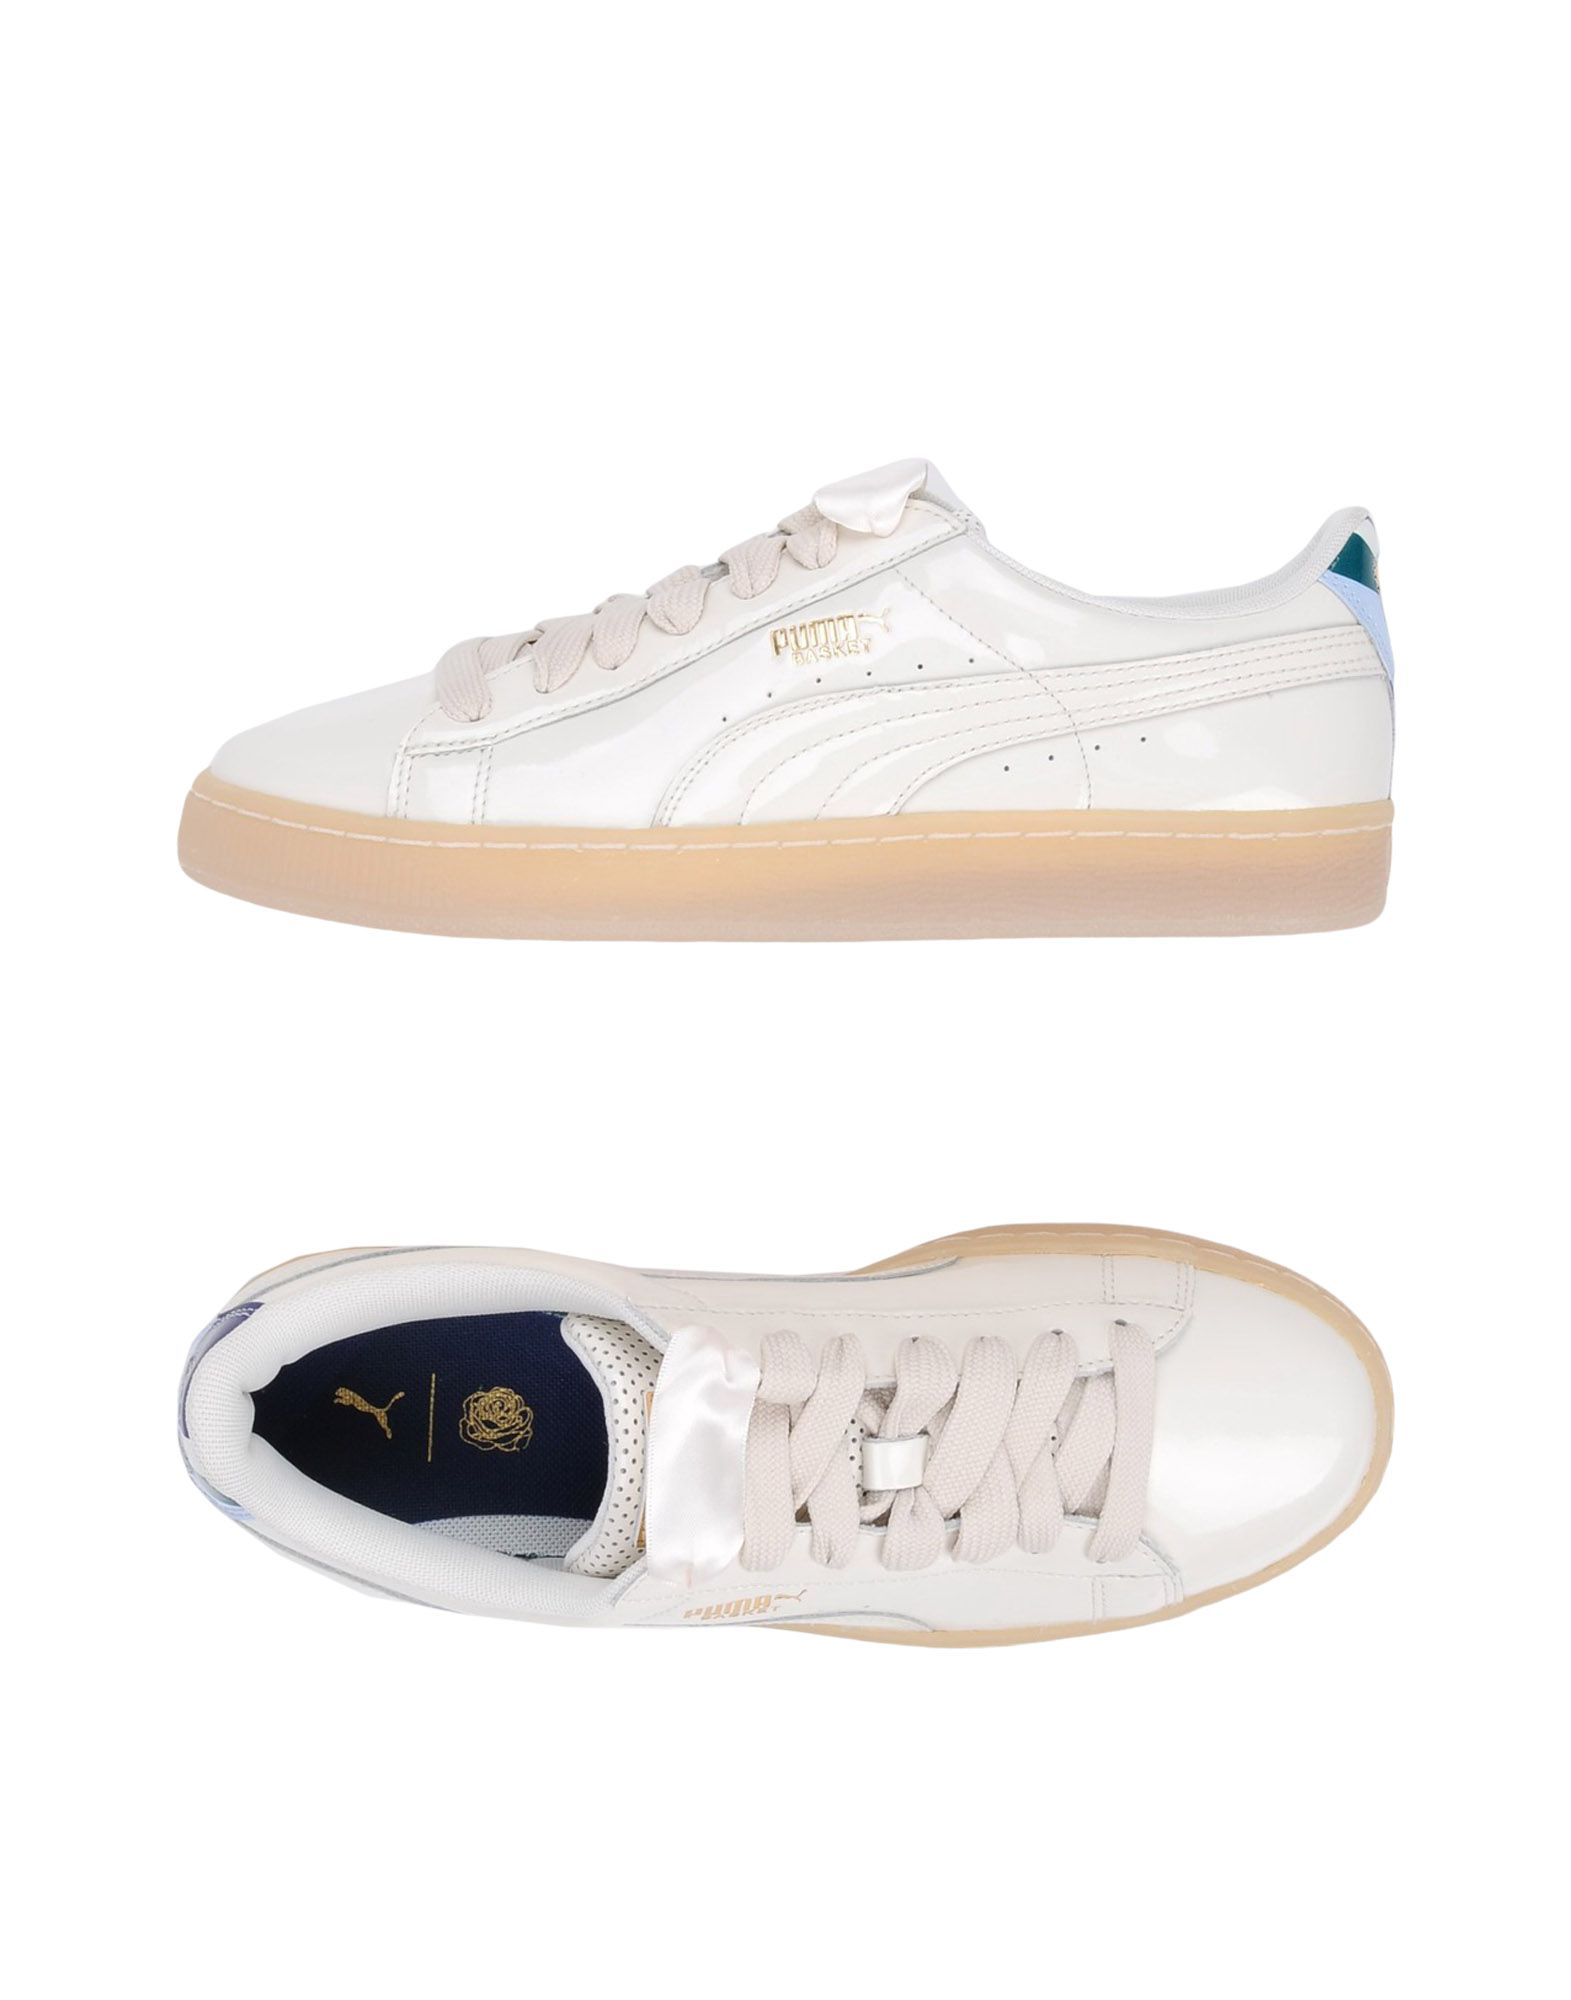 Puma X Careaux -  Basket - Sneakers - Careaux Women Puma X Careaux Sneakers online on  Australia - 11277184IW 96b7d7